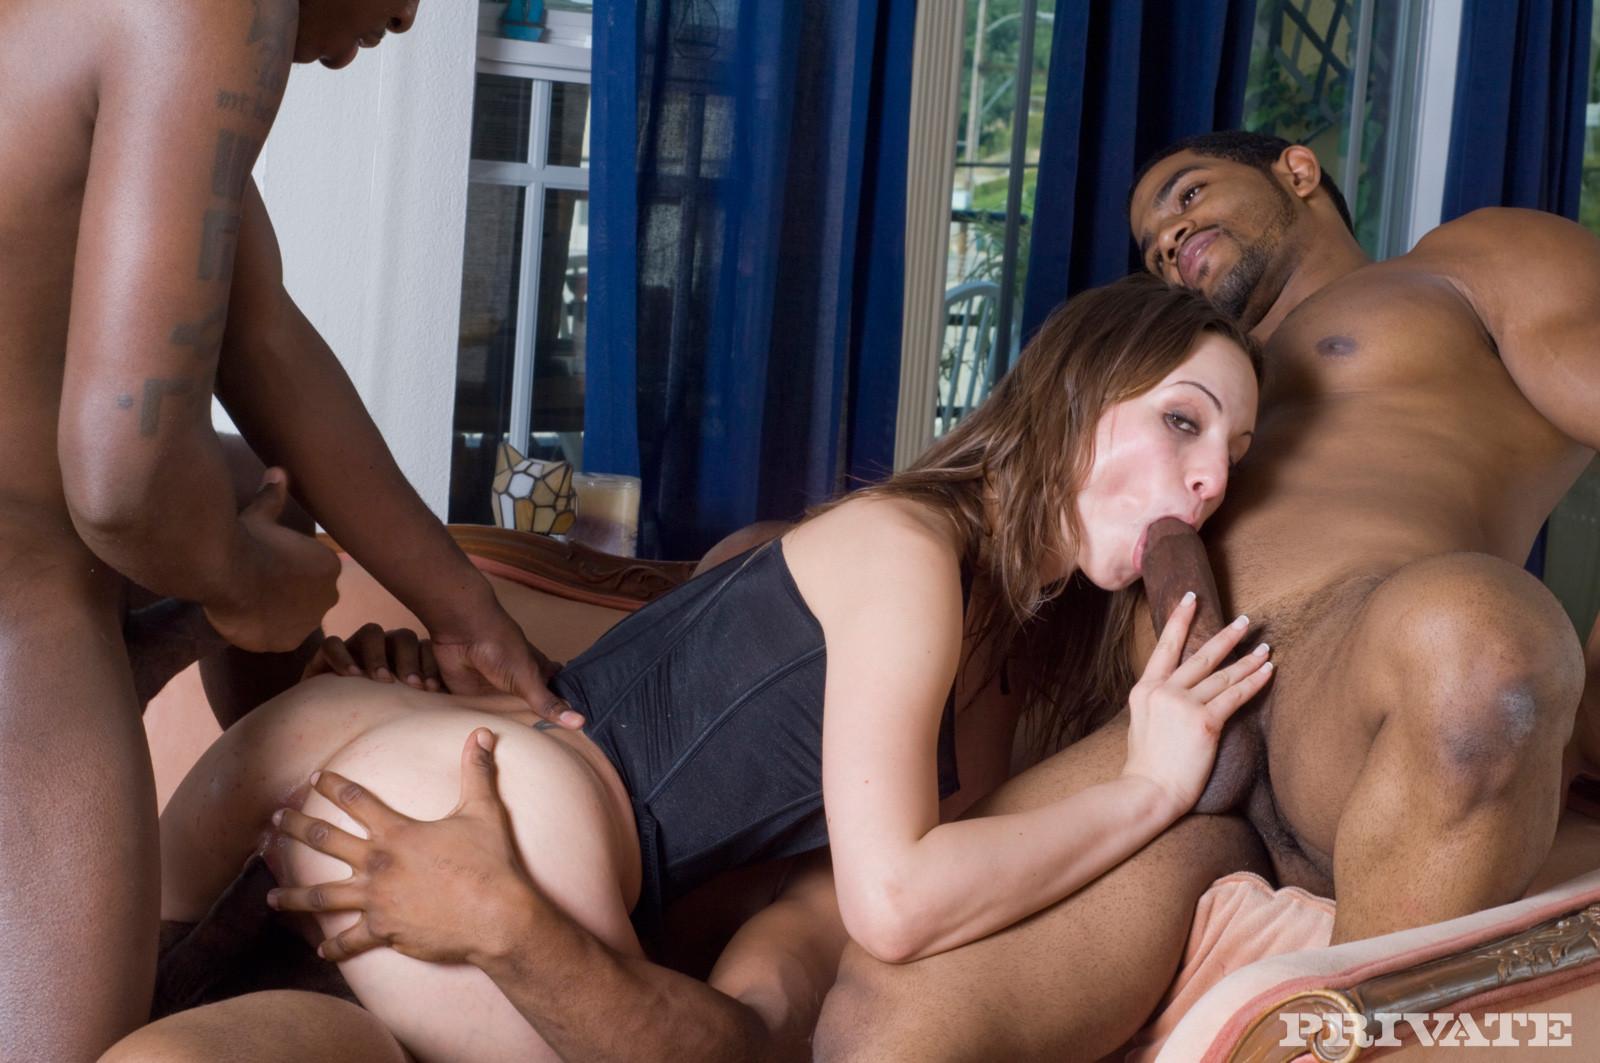 Amber Rayne - Куколд - Порно галерея № 3462791